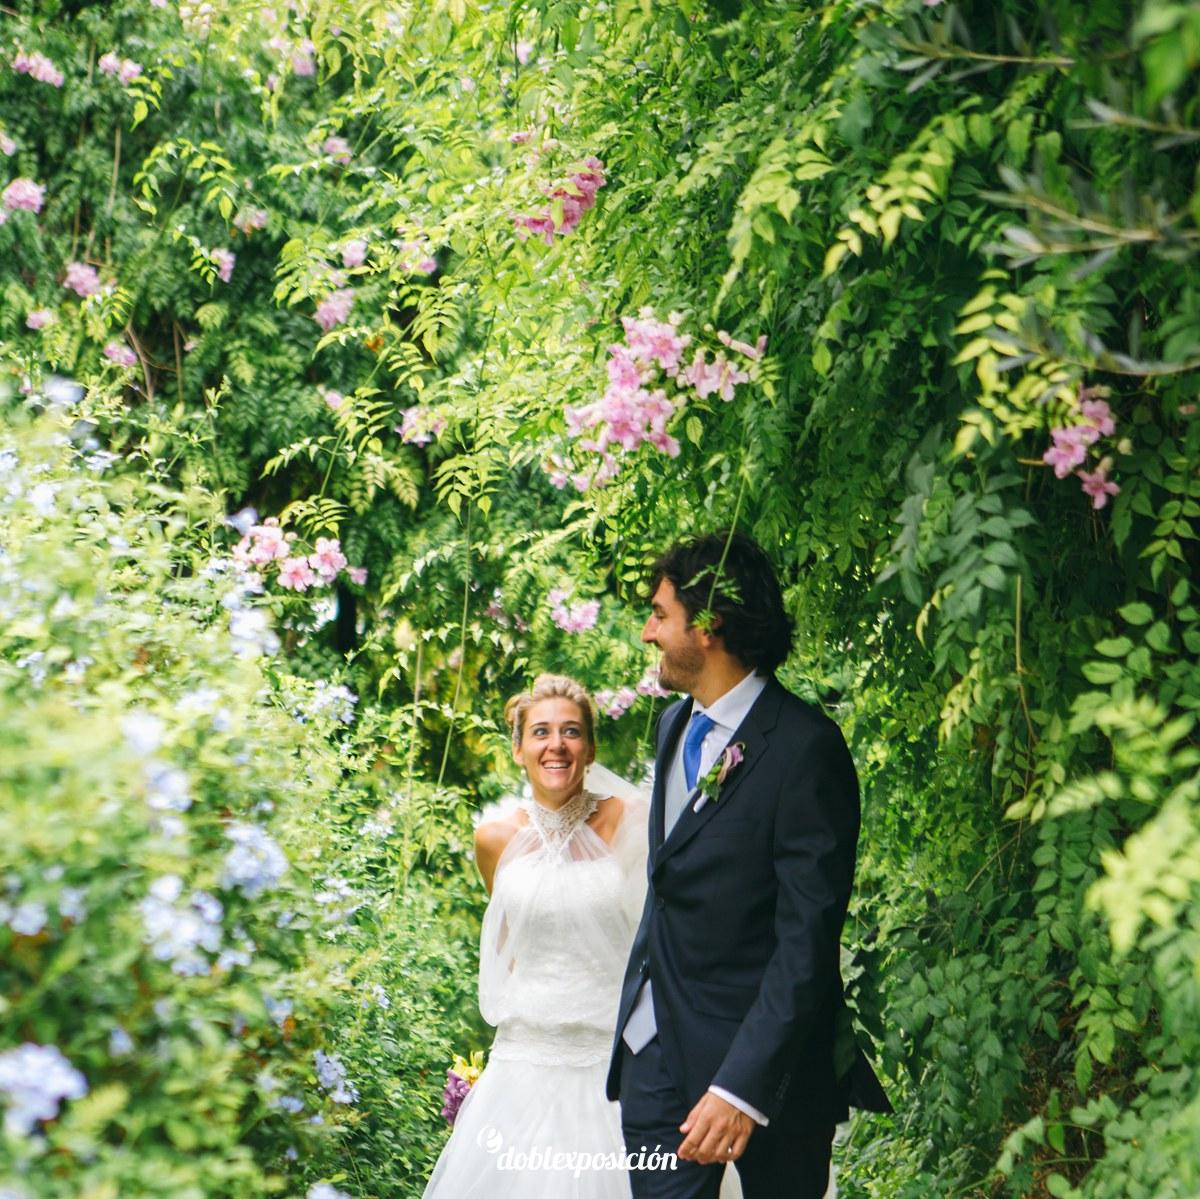 fotografos-boda-finca-jardines-de-abril-alicante_0030